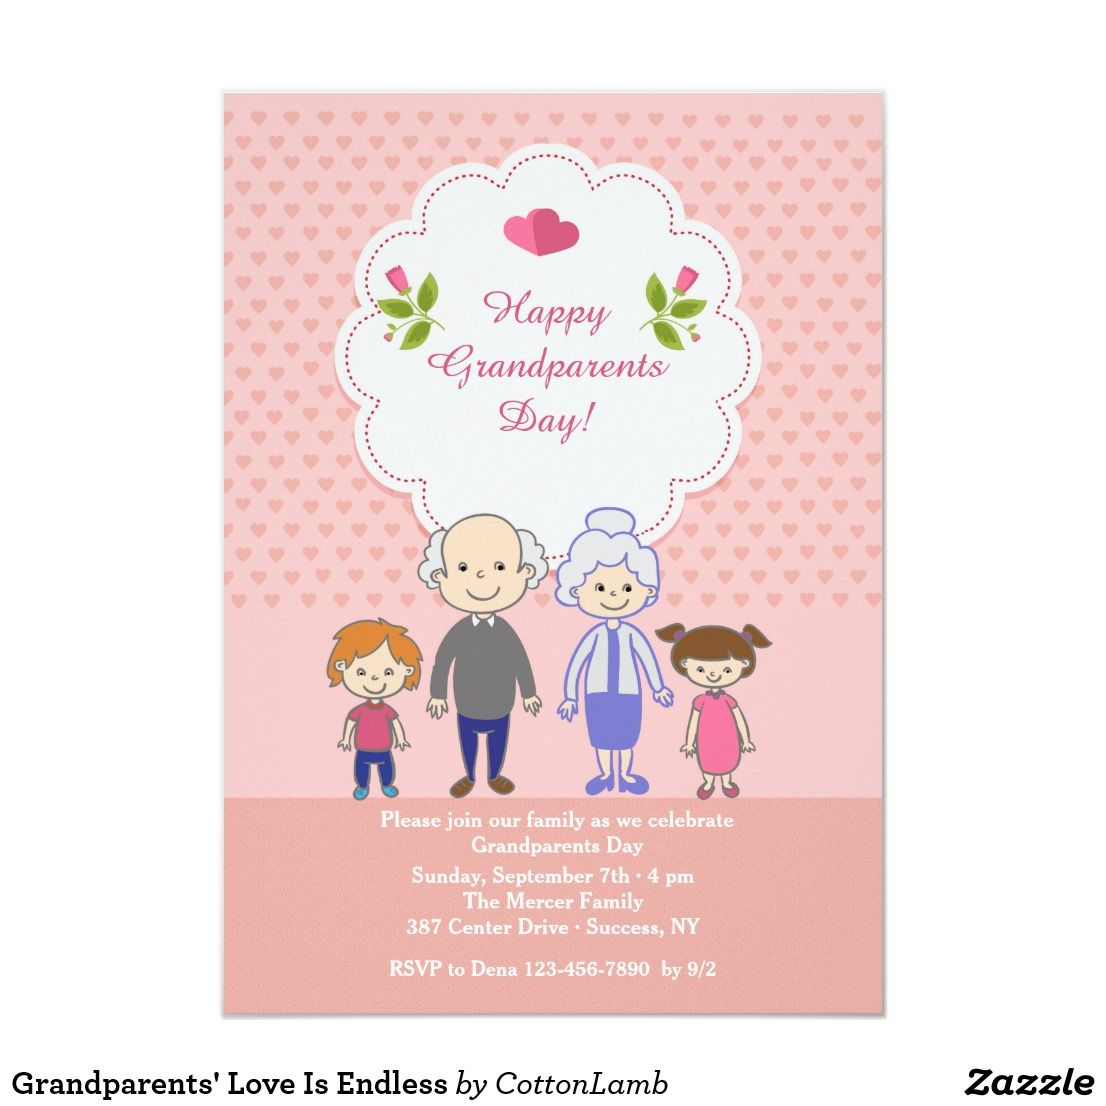 Grandparents Love Is Endless Invitation Zazzle Com Happy Grandparents Day Grandparents Card Grandparents Day